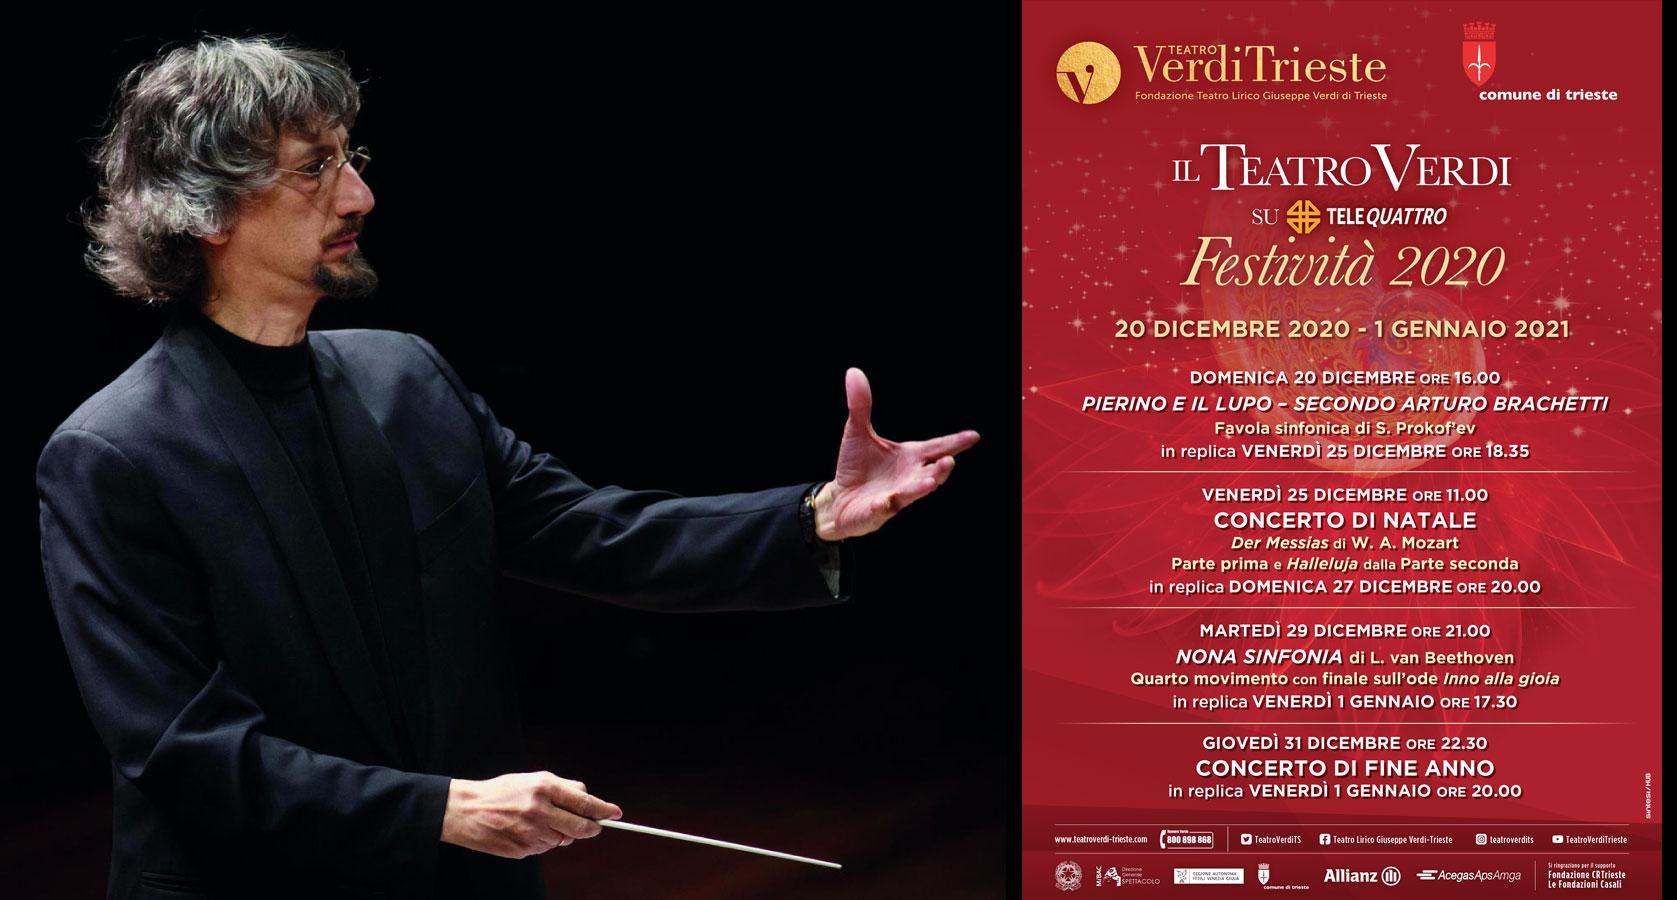 maestro Federico Maria Sardelli Teatro Verdi di Trieste